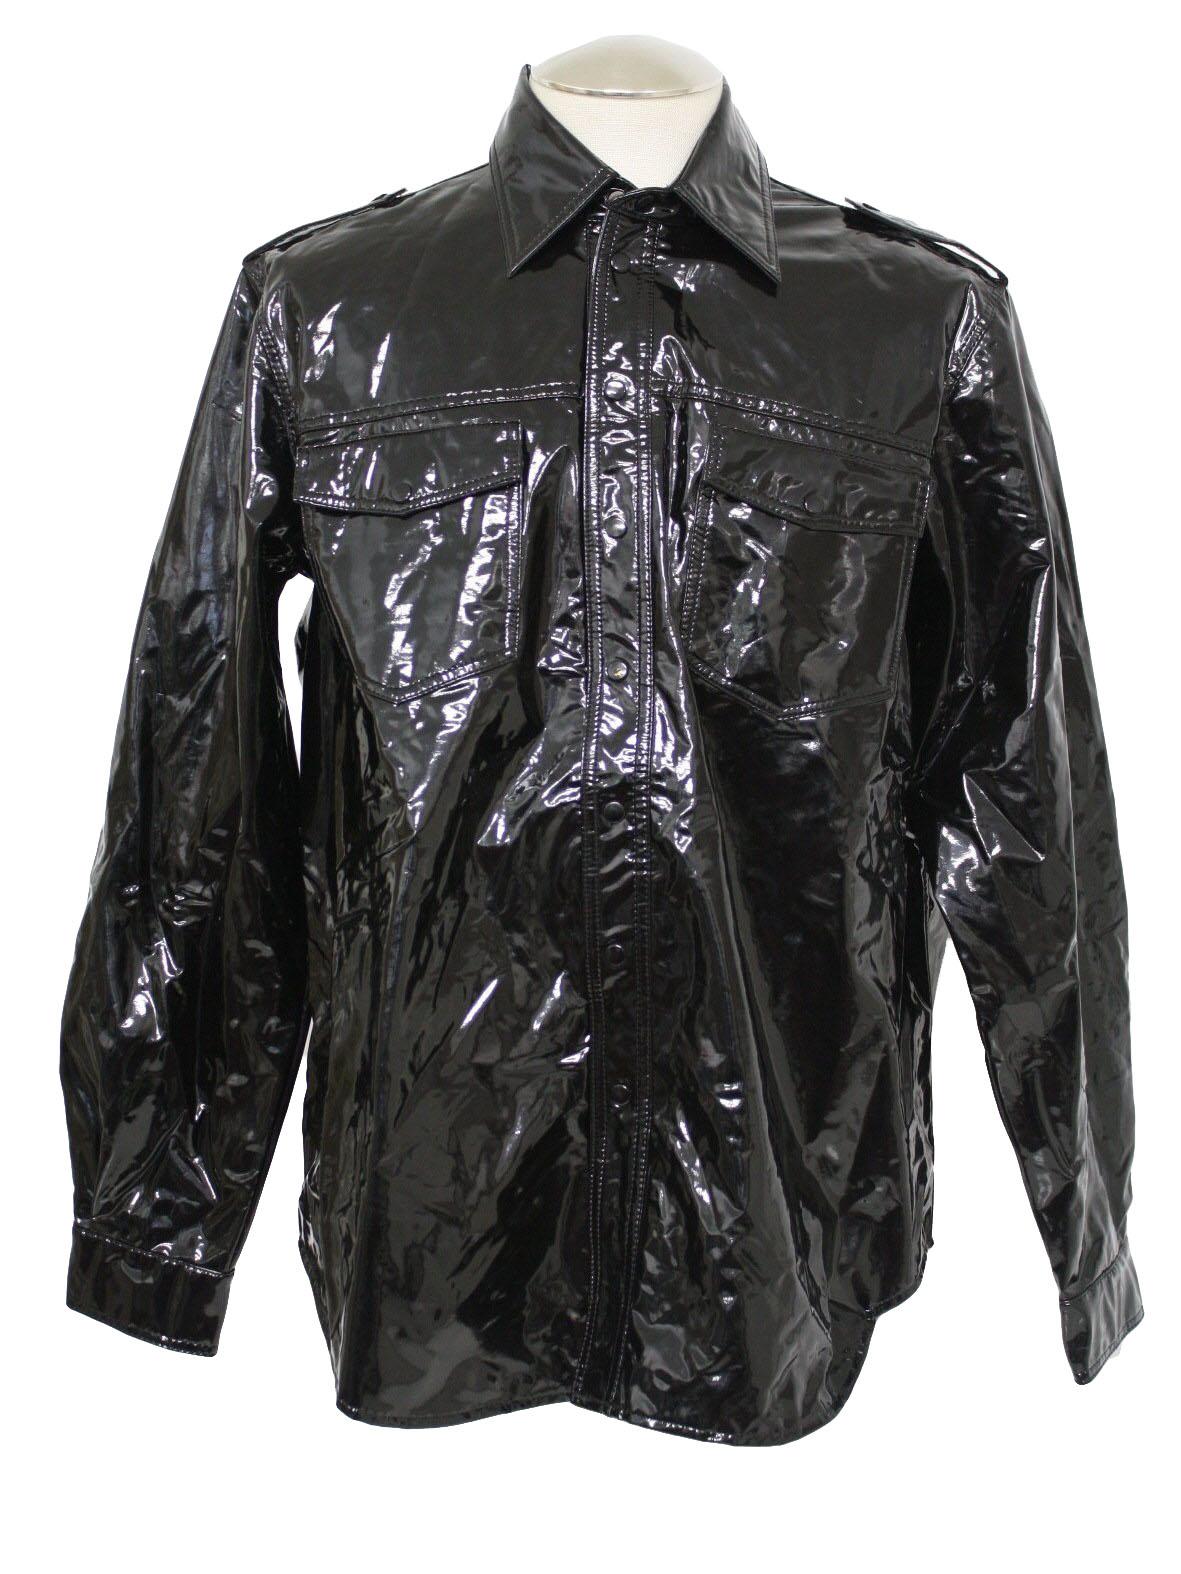 Ledapol 1960s Vintage Jacket 60s Made In 80s Ledapol